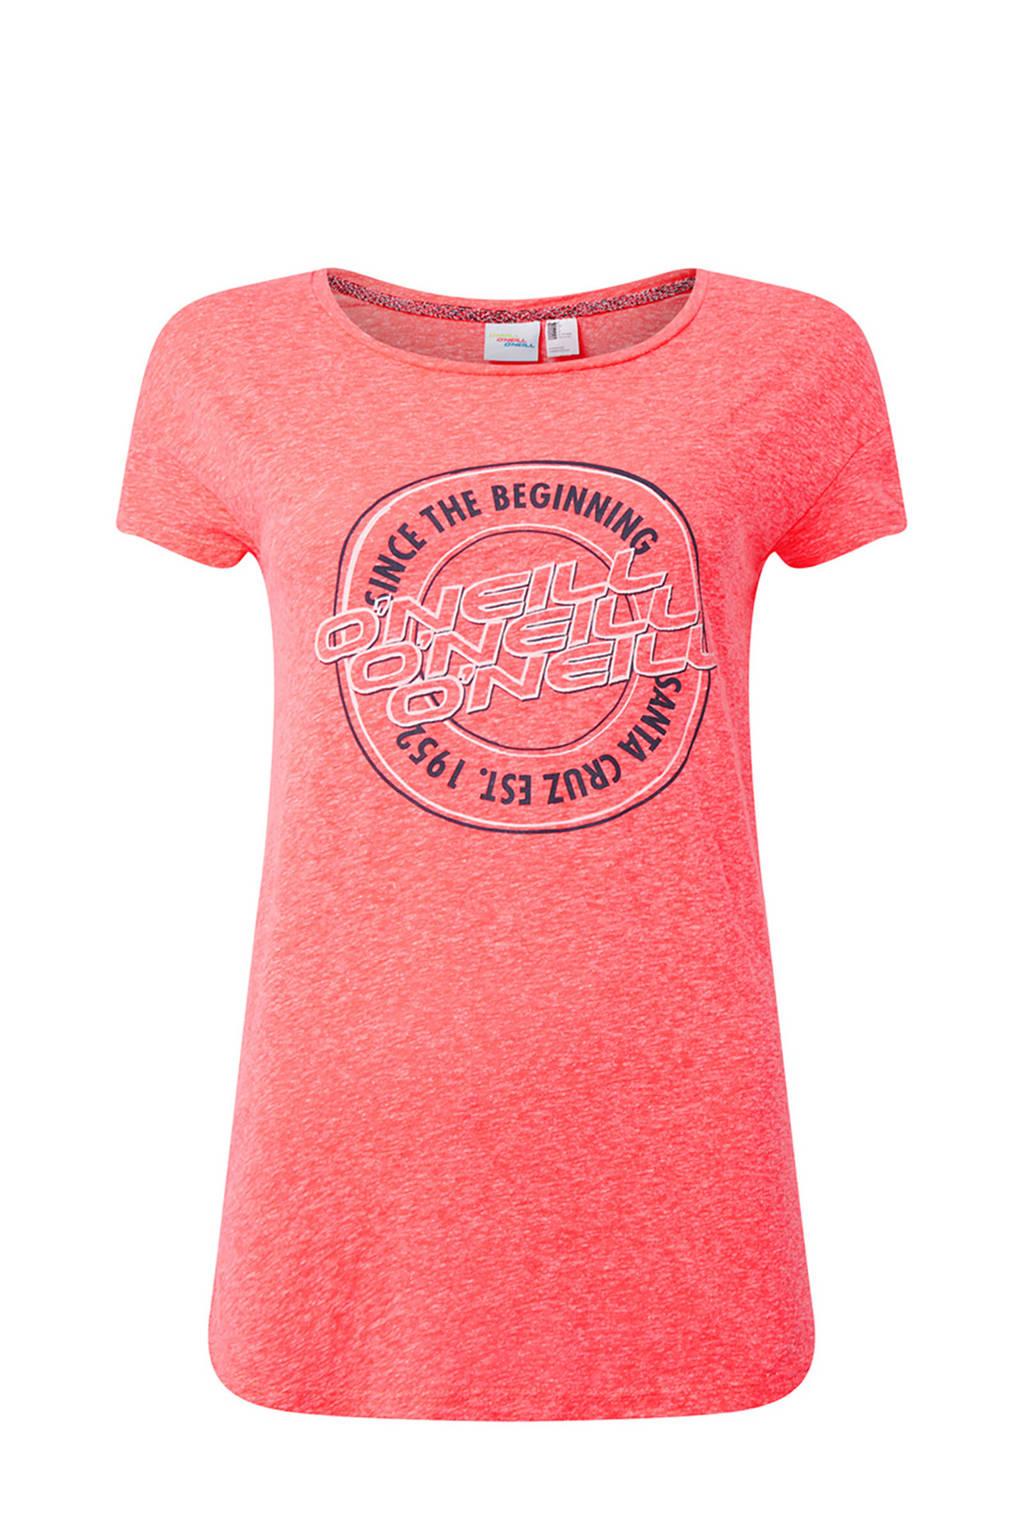 O'Neill T-shirt met tekst knockout pink, Knockout Pink